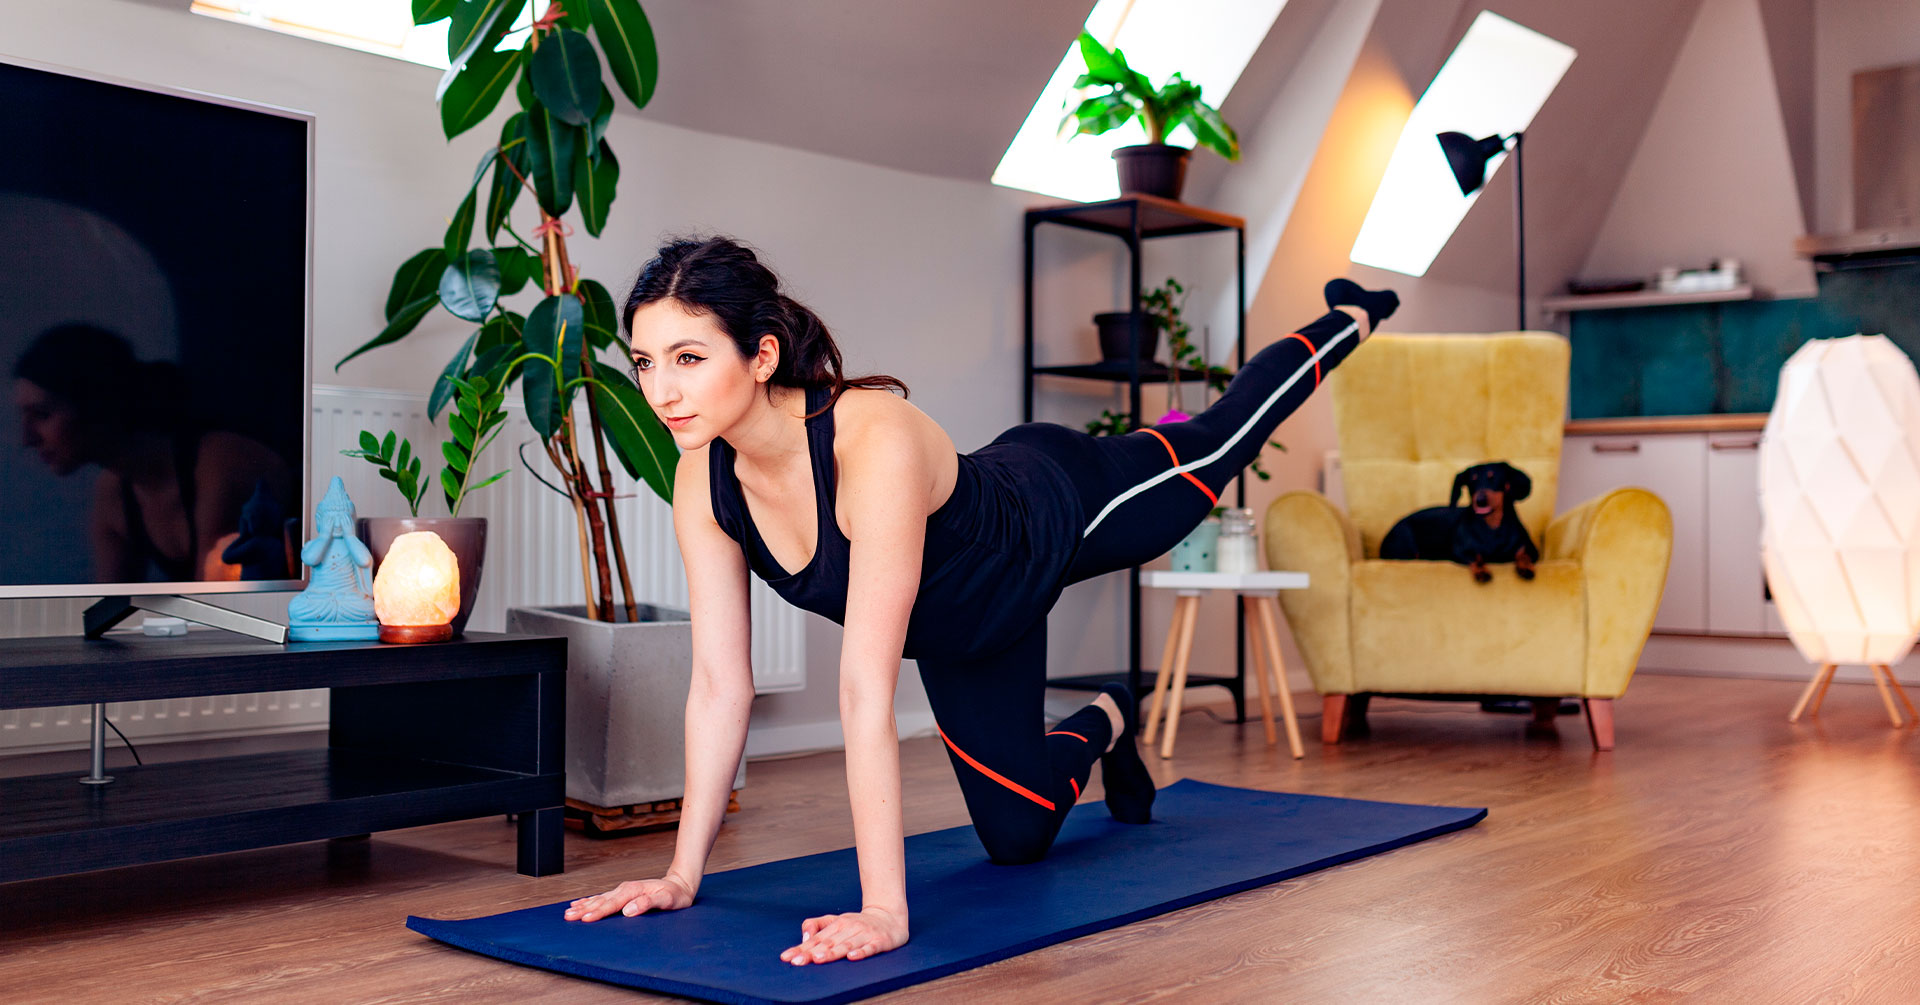 Actívate con esta rutina de ejercicios para mujeres en casa